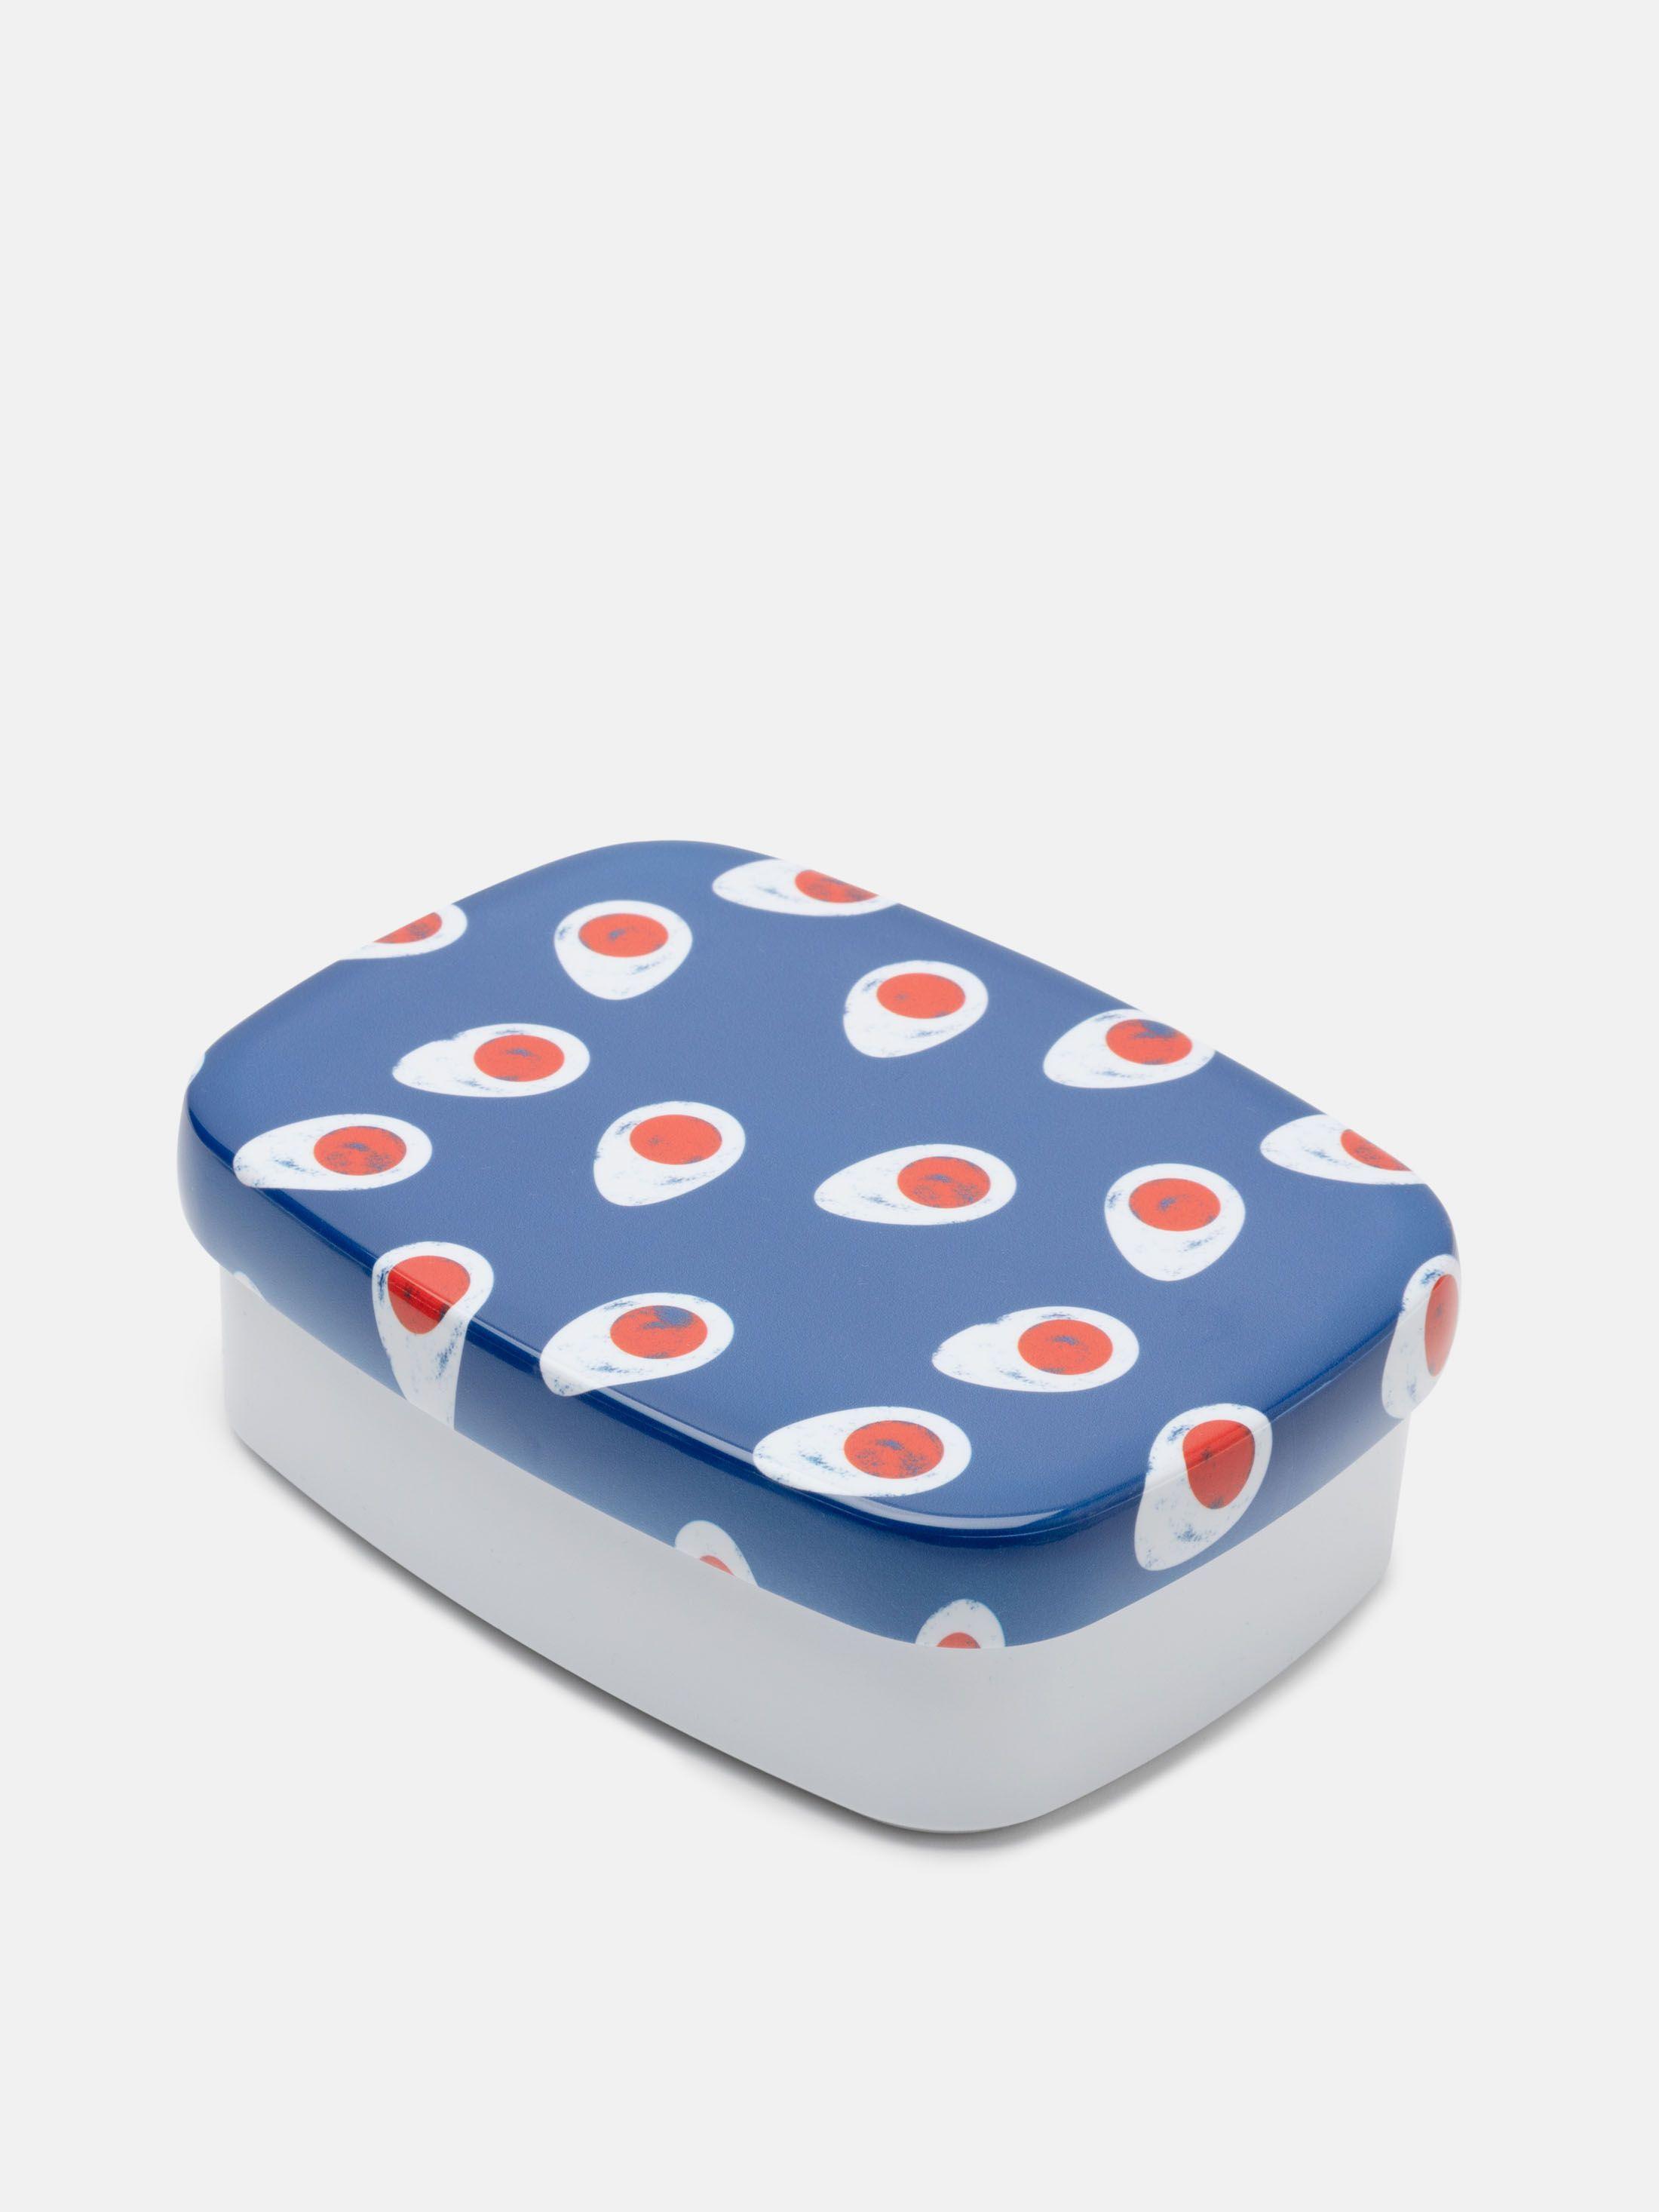 custom lunch box printed in UK